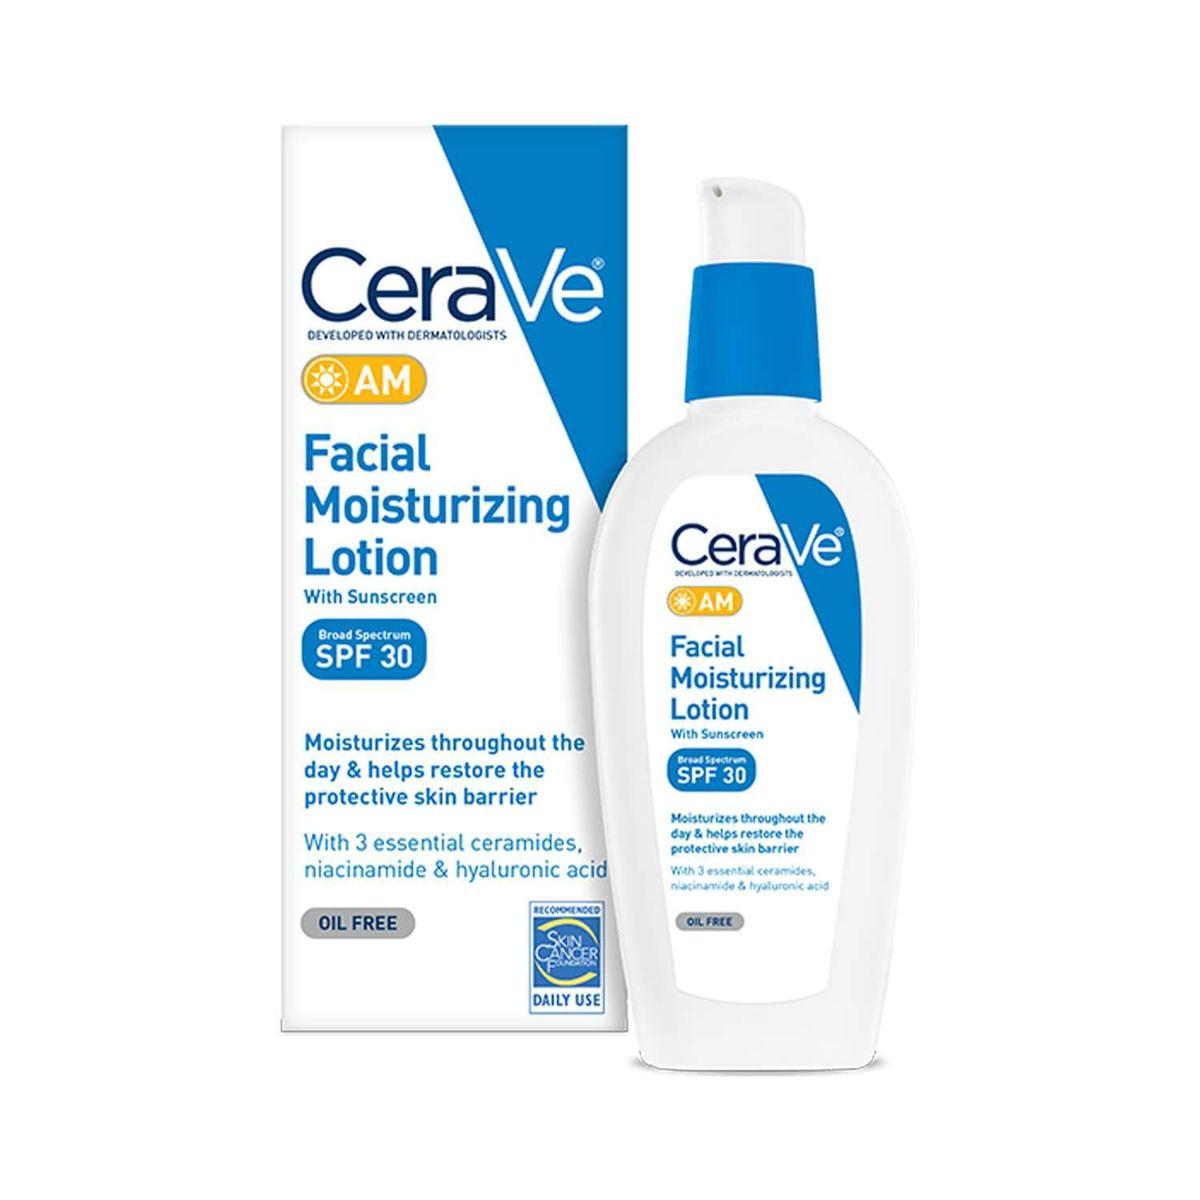 AM Facial Moisturizing Lotion SPF 30